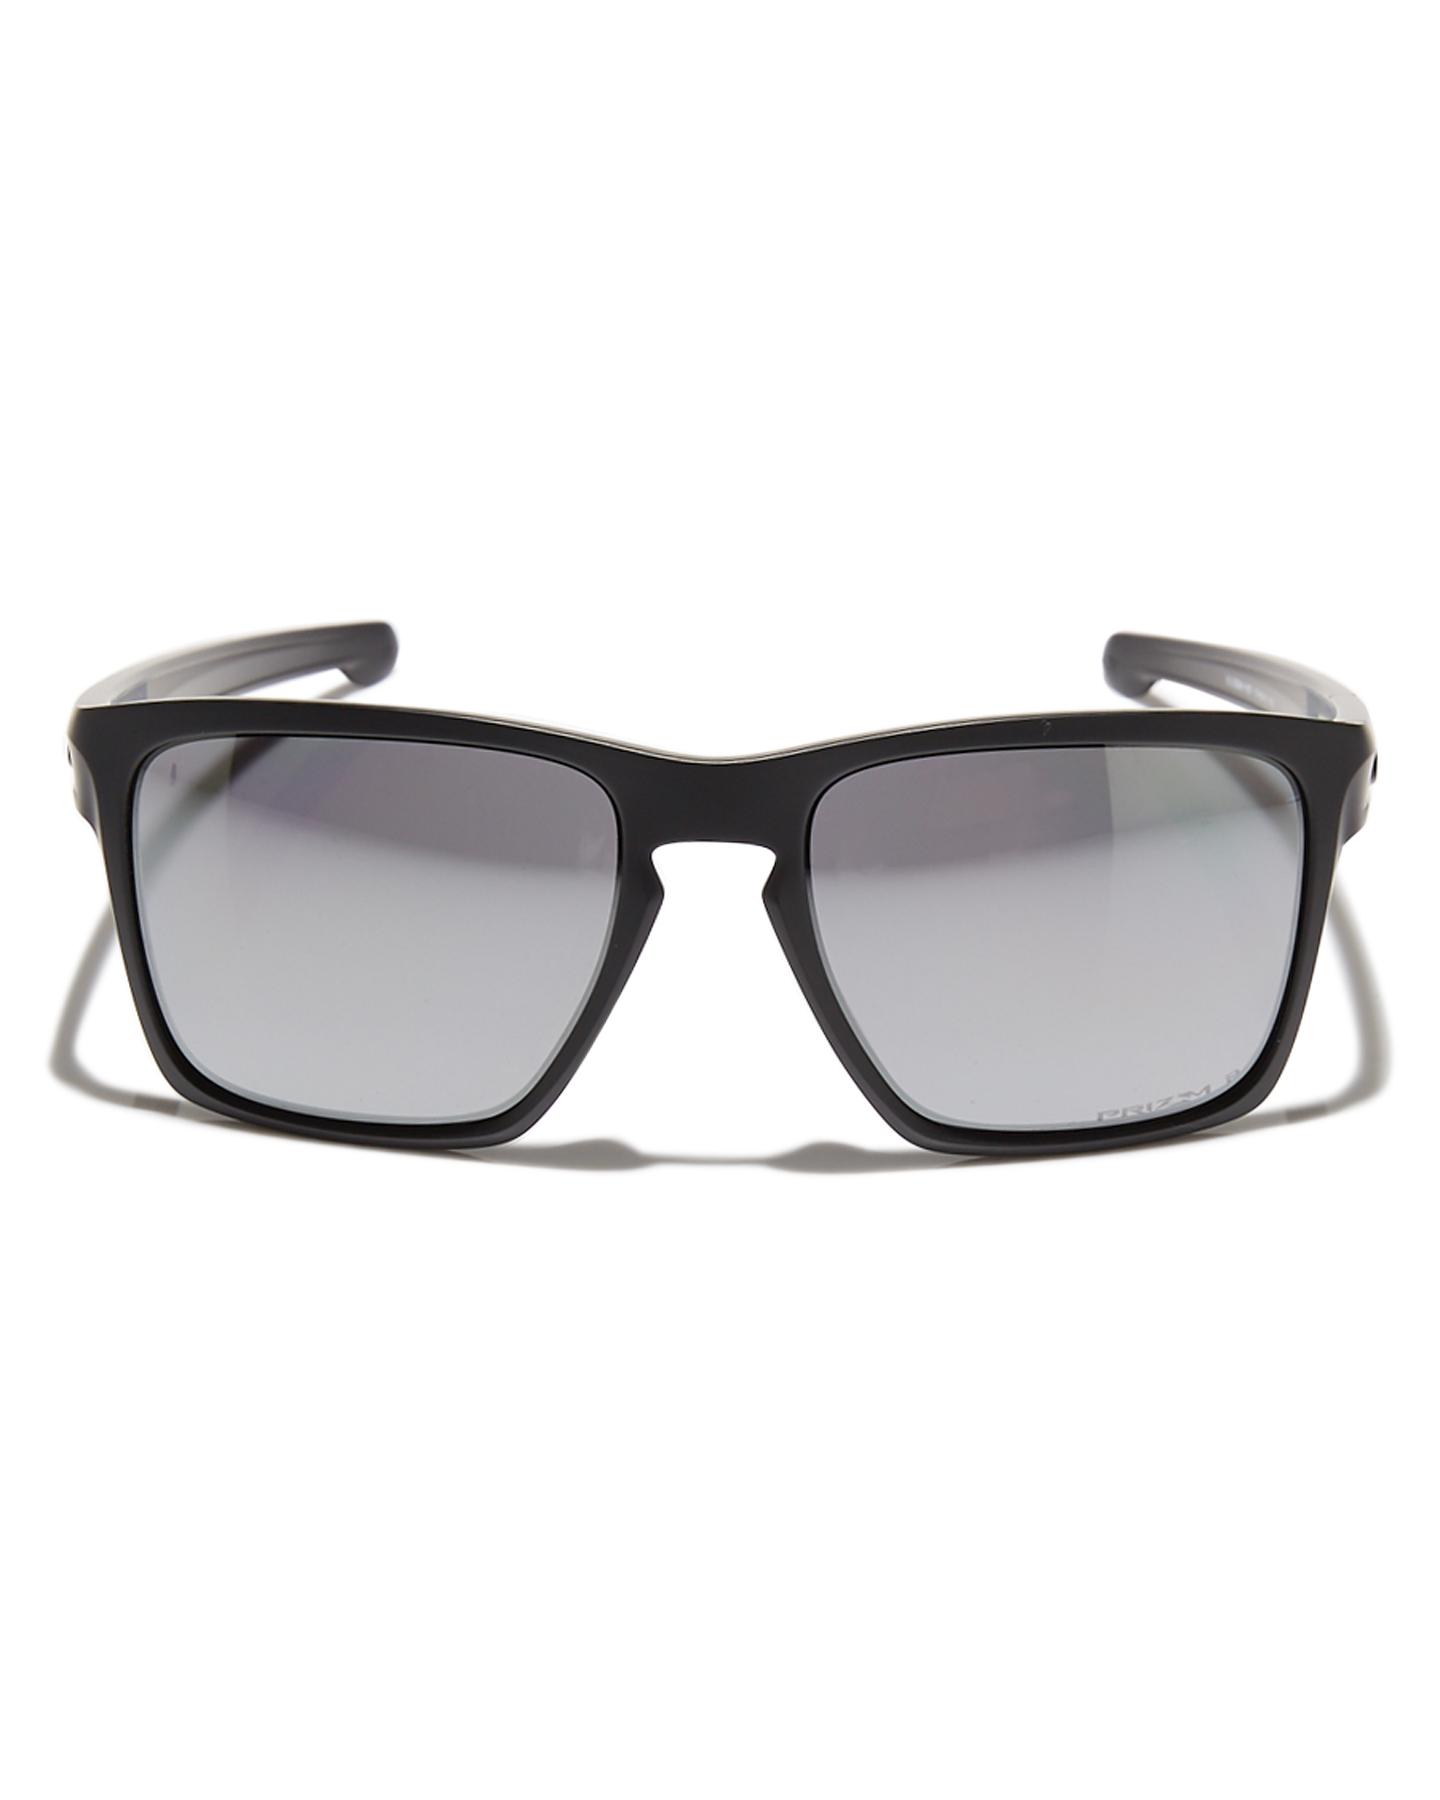 085239e87e Oakley Sliver Xl Sunglasses - Matte Black Prizm